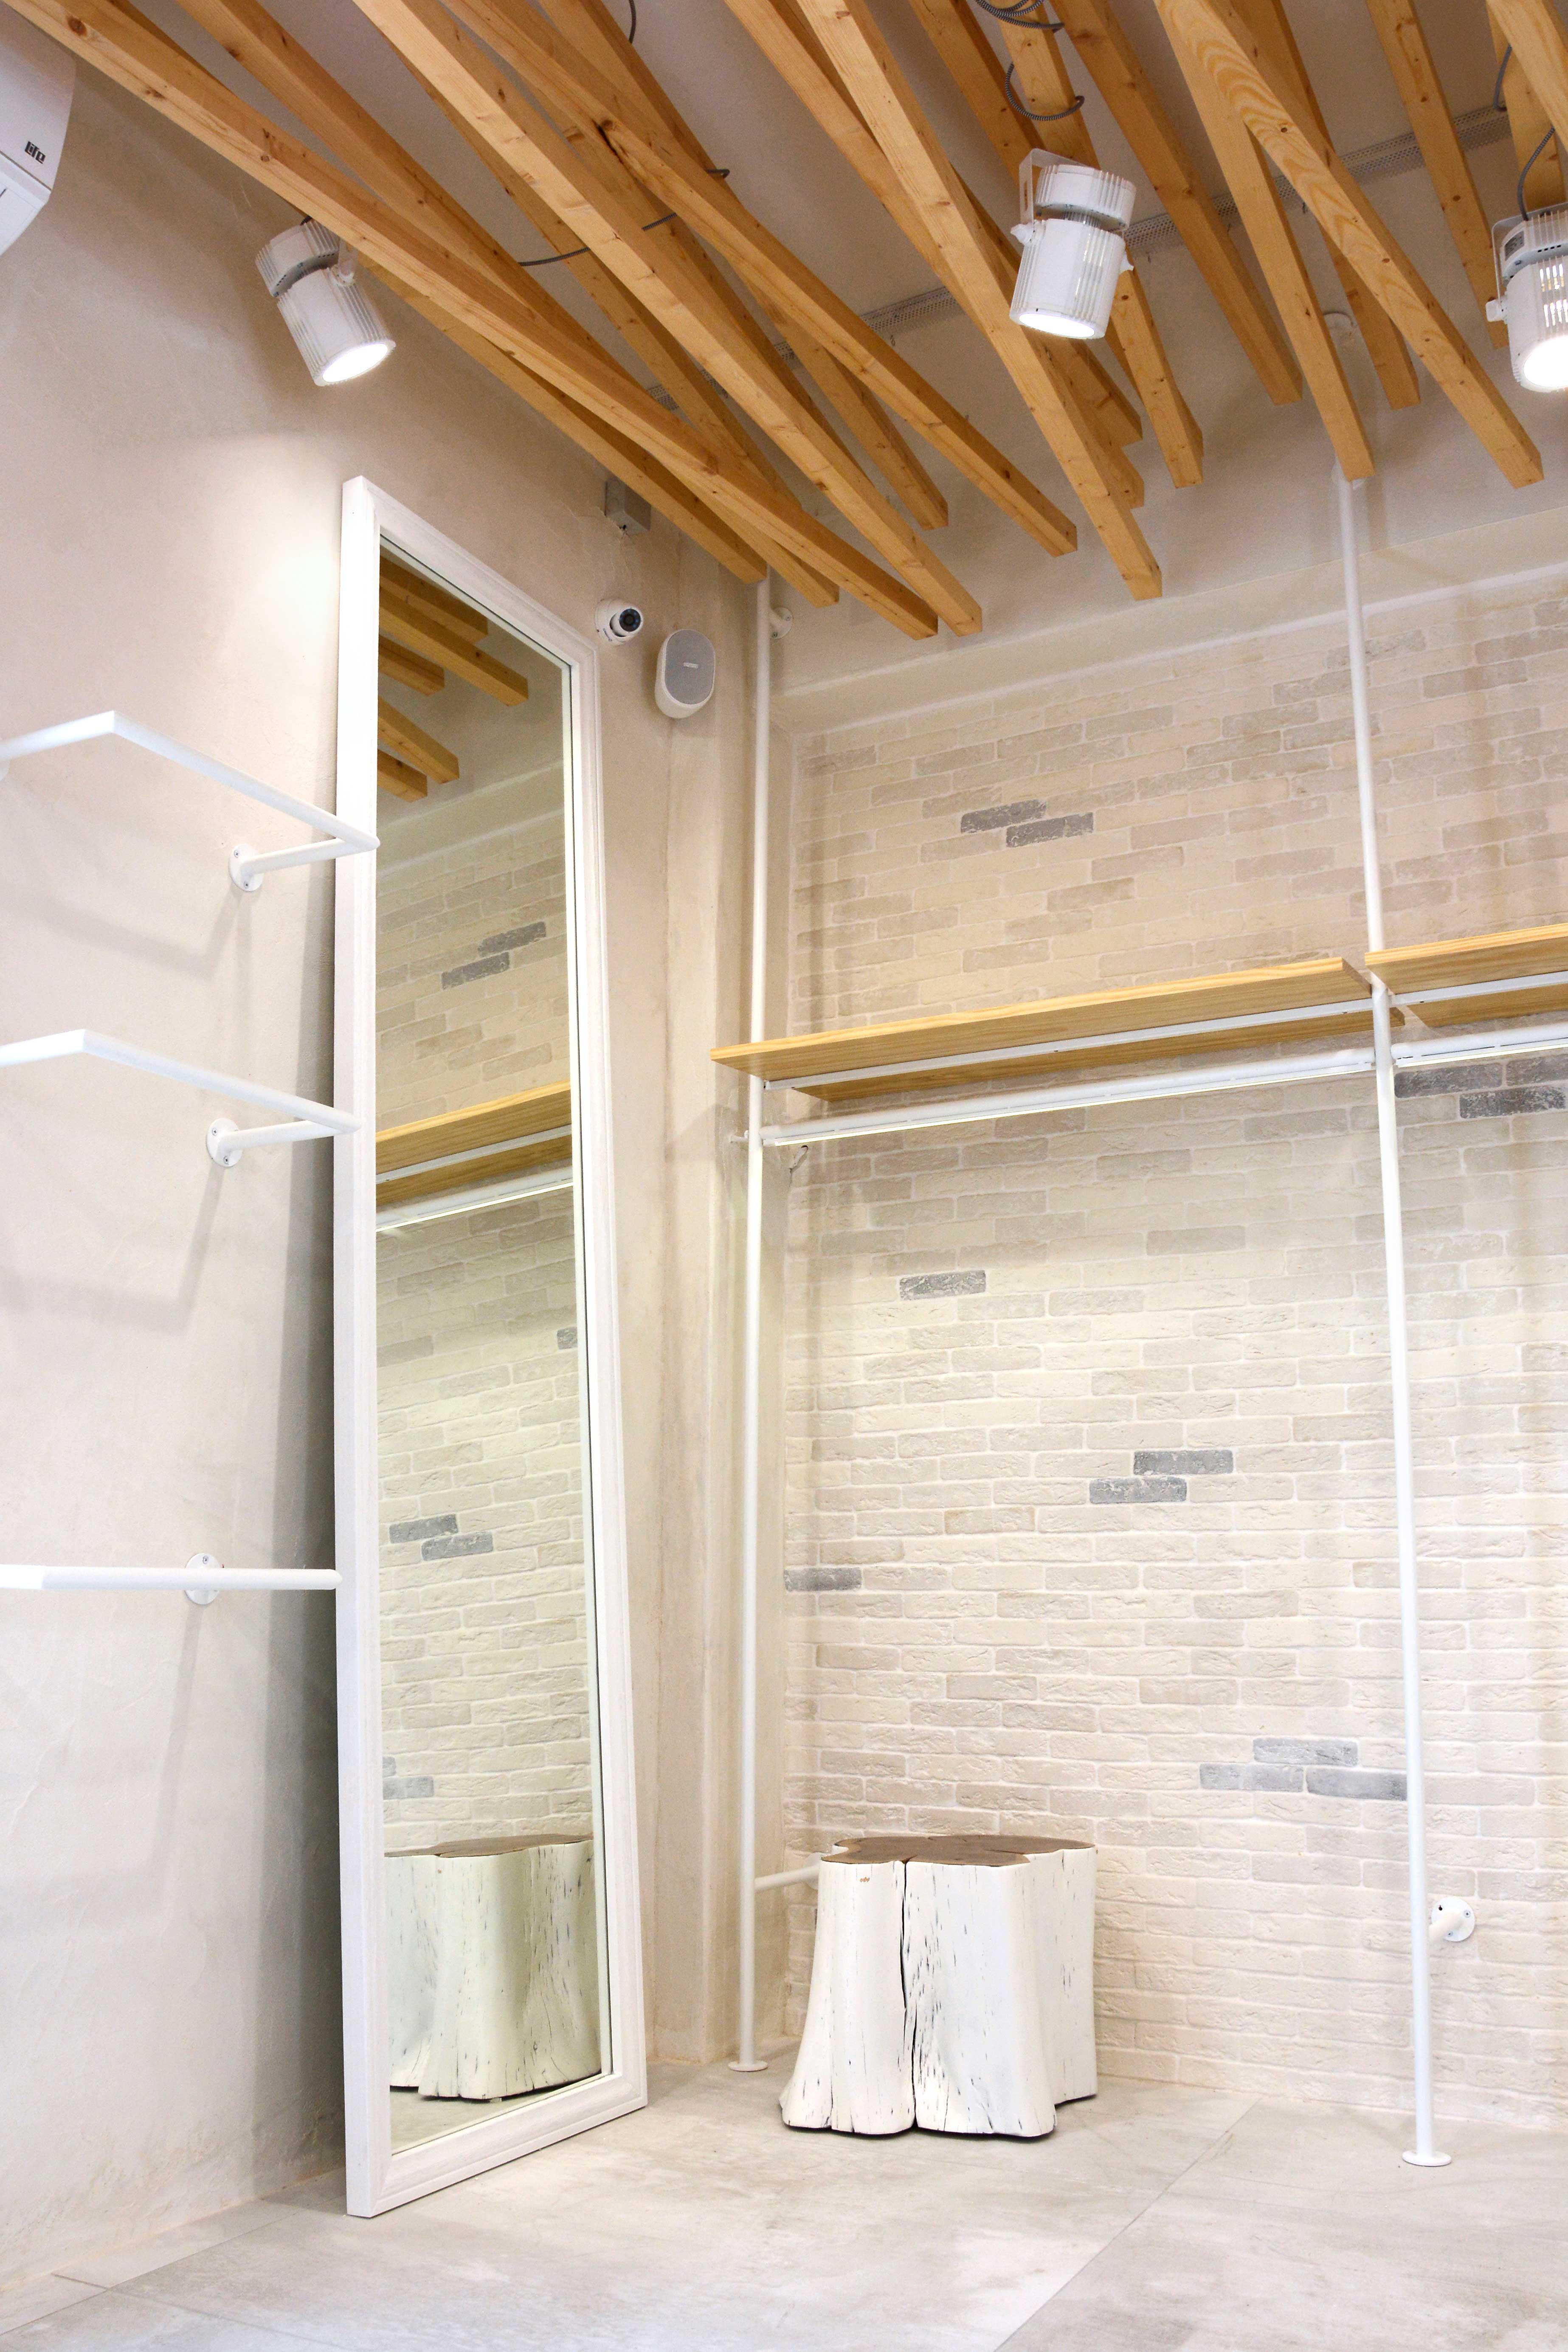 White Store   Κritikoswood   Accoya   Wooden Frames